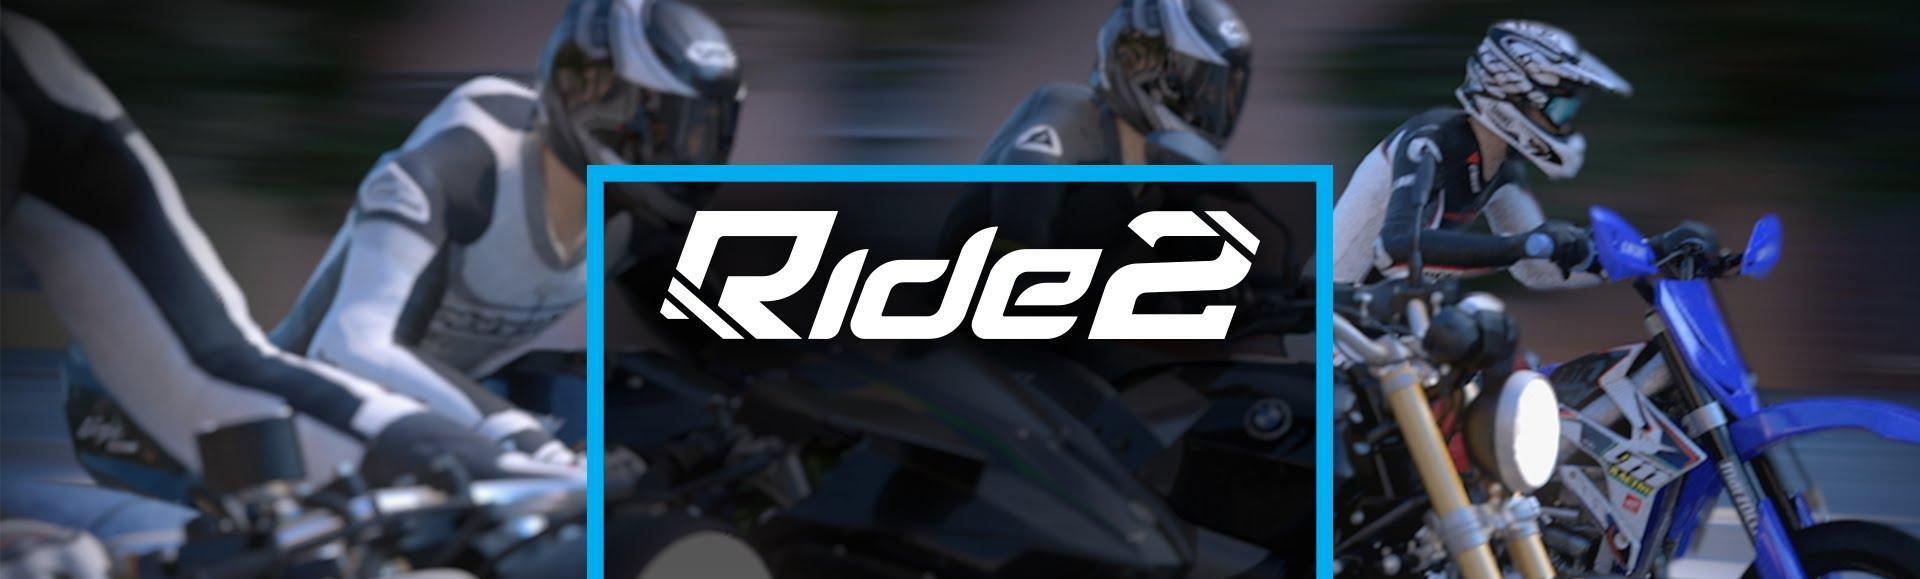 Ride 2 Logo and Screenshot